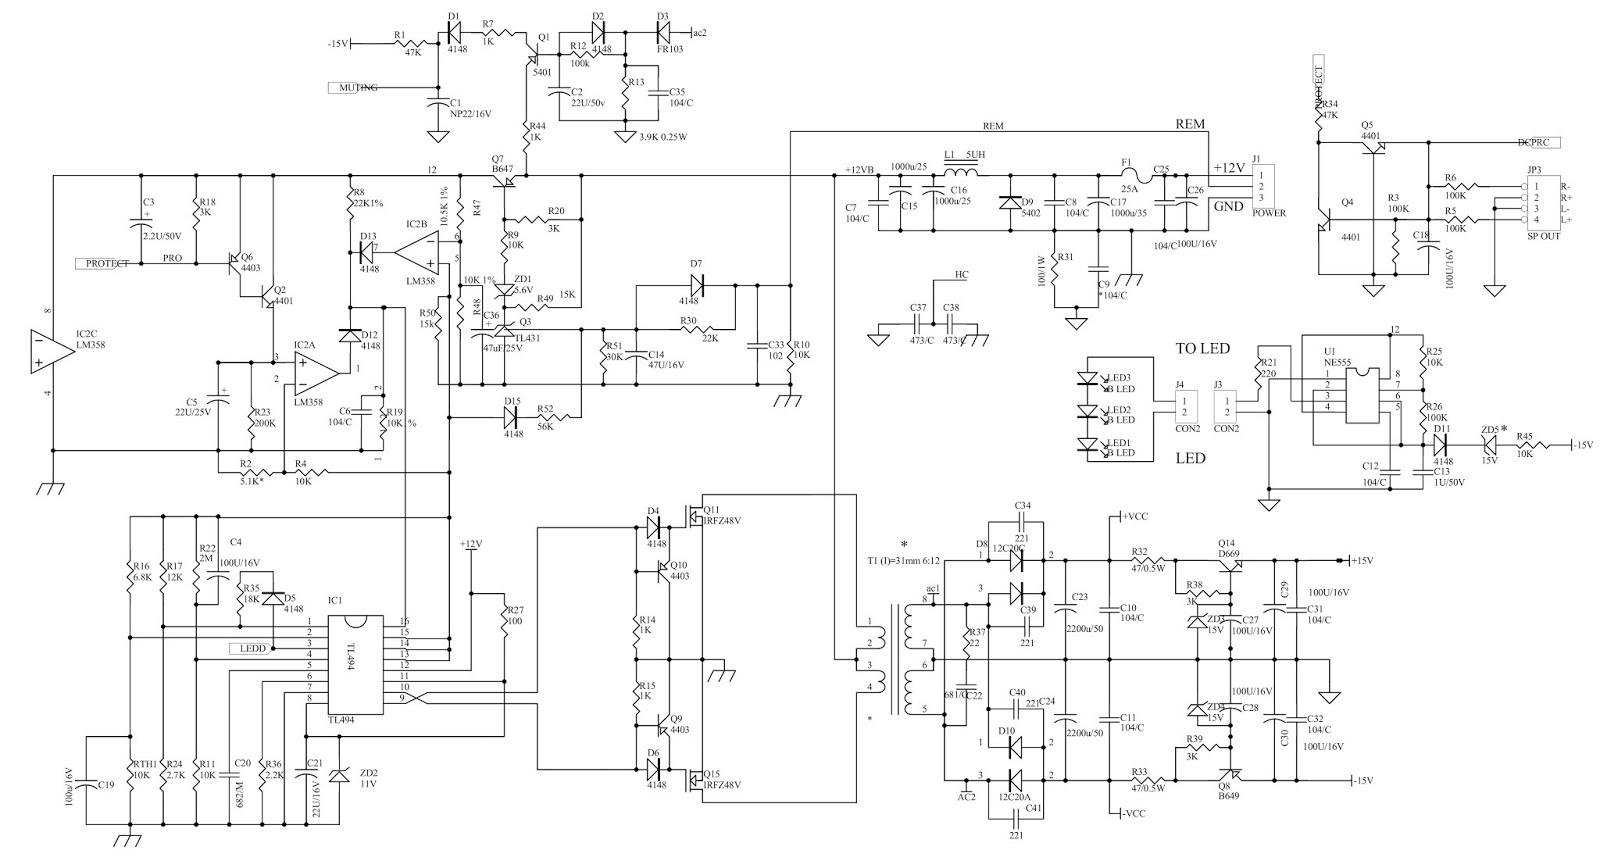 Jbl Ma6002 Marine Series Schematic Diagram 2 Channel Amplifier Qm Wiring Diagrams Electro Help